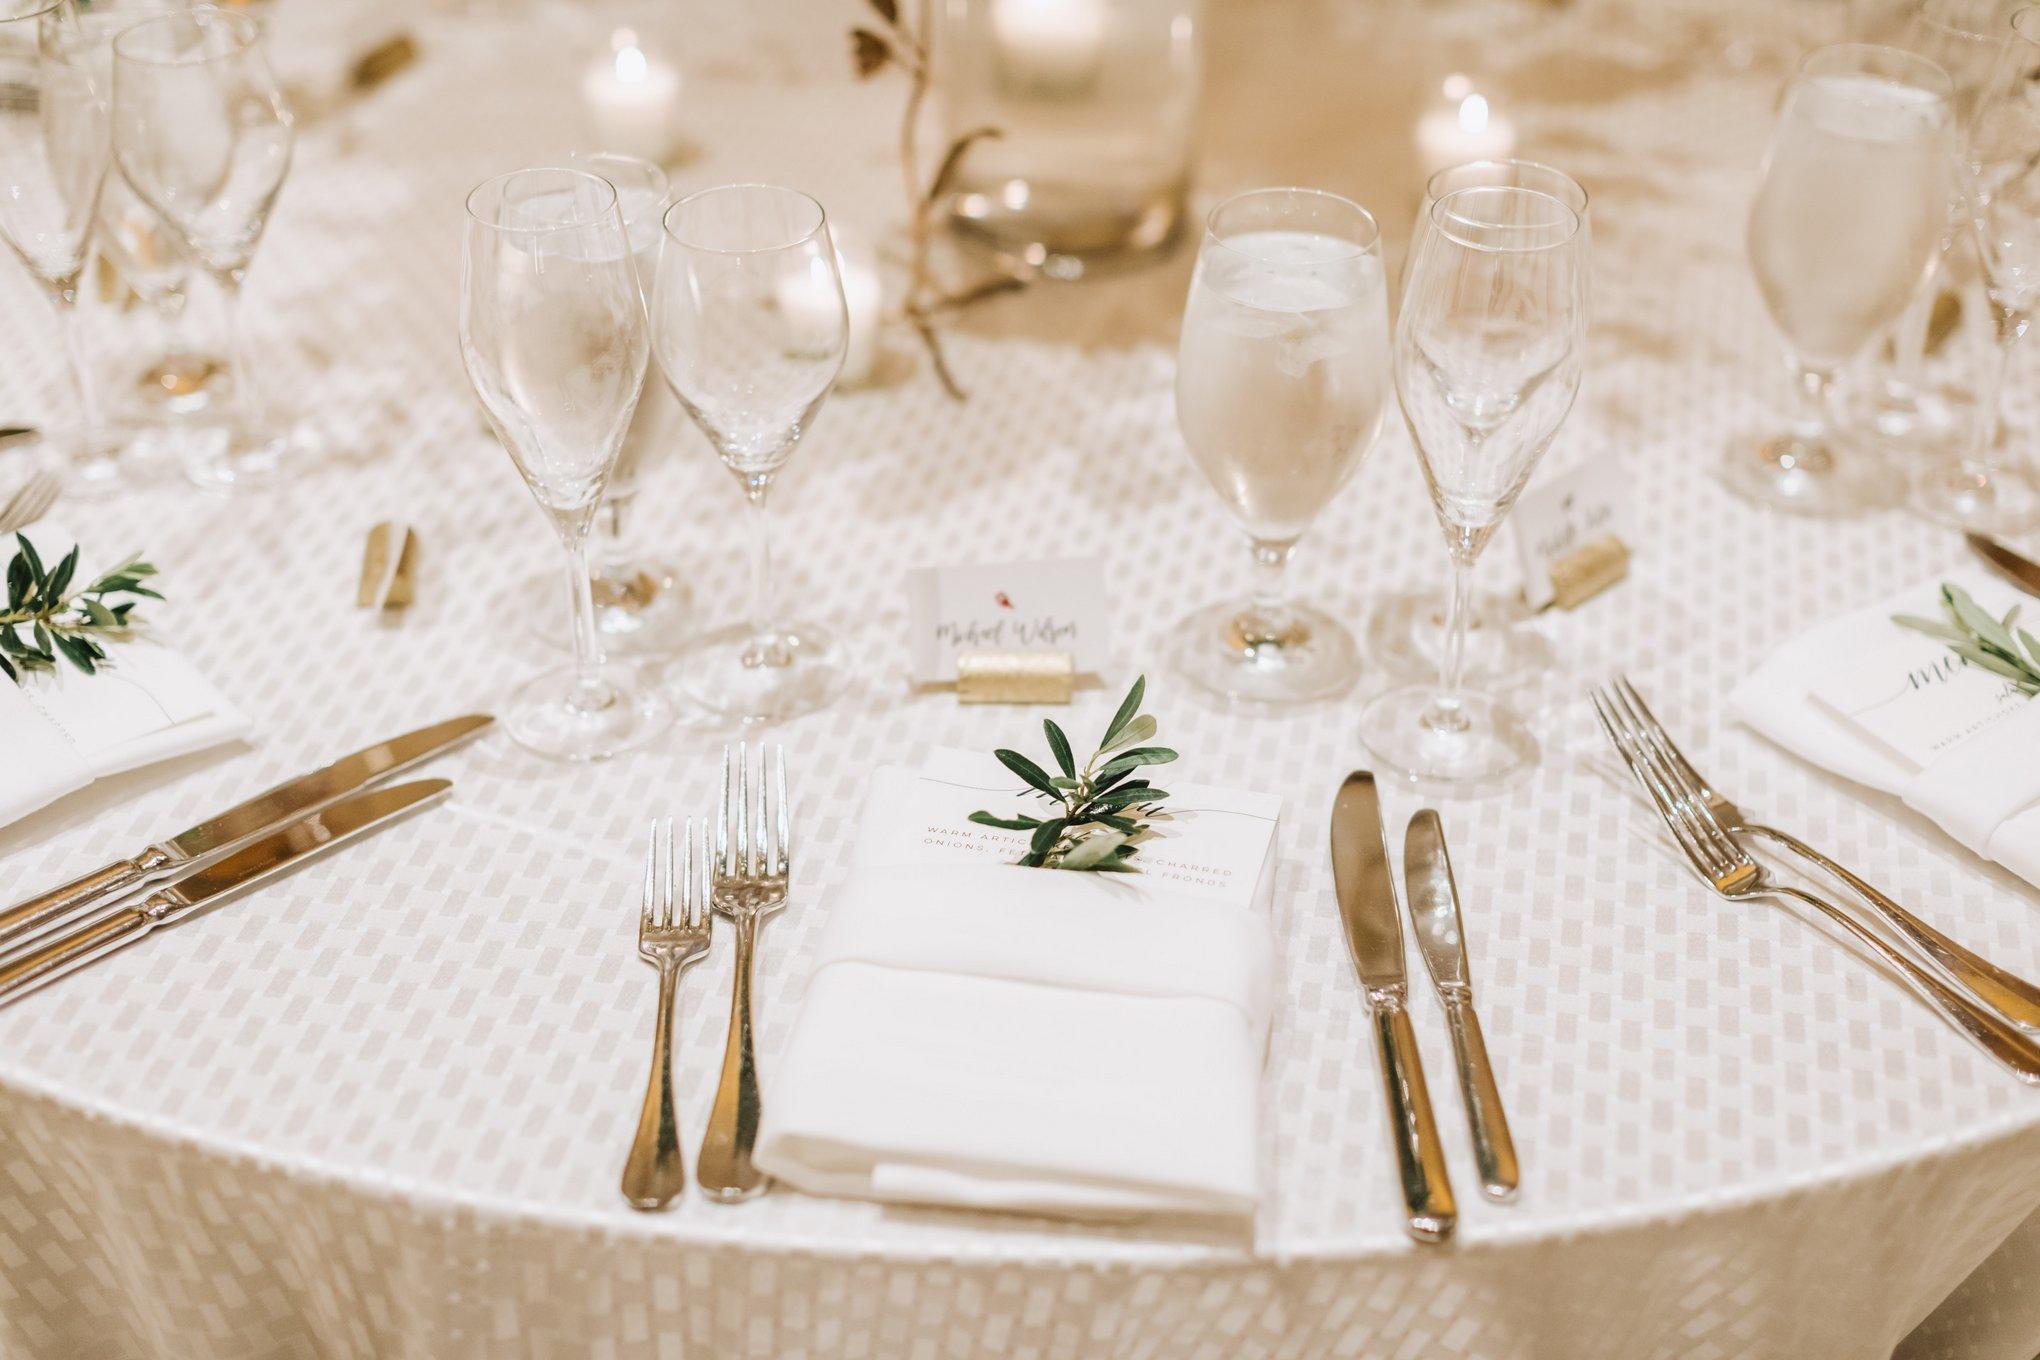 Wequassett-Wedding-Photographer-Cape-Cod-Boston-Lena-Mirisola-40.jpg